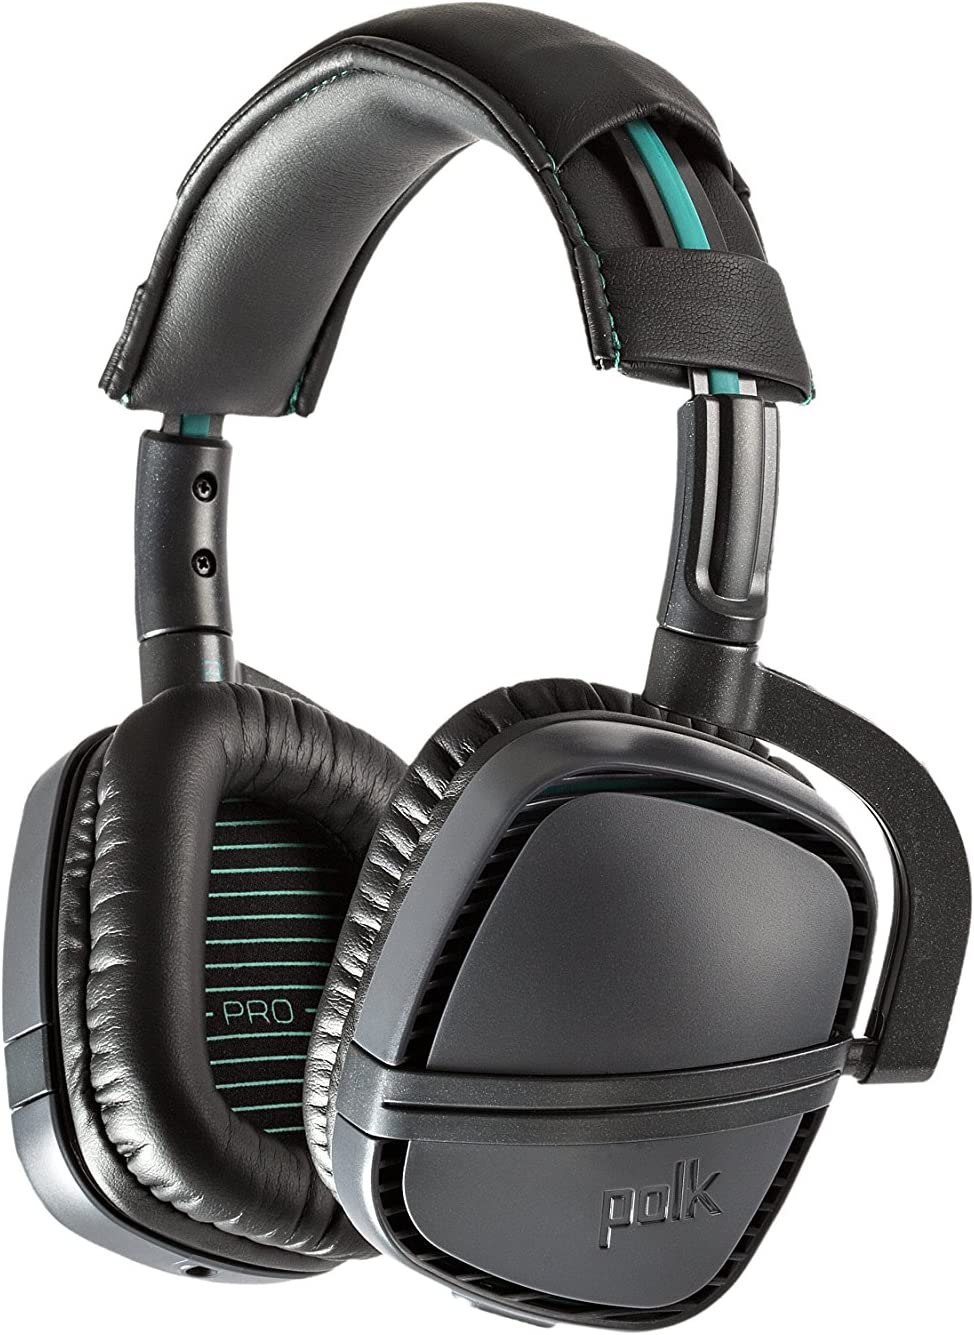 Polk Audio Striker Jack Wiring Worksheet And Diagram Stereo Headphone Plug Amazon Com Pro Zx Gaming Headset Xbox One Rh Phone